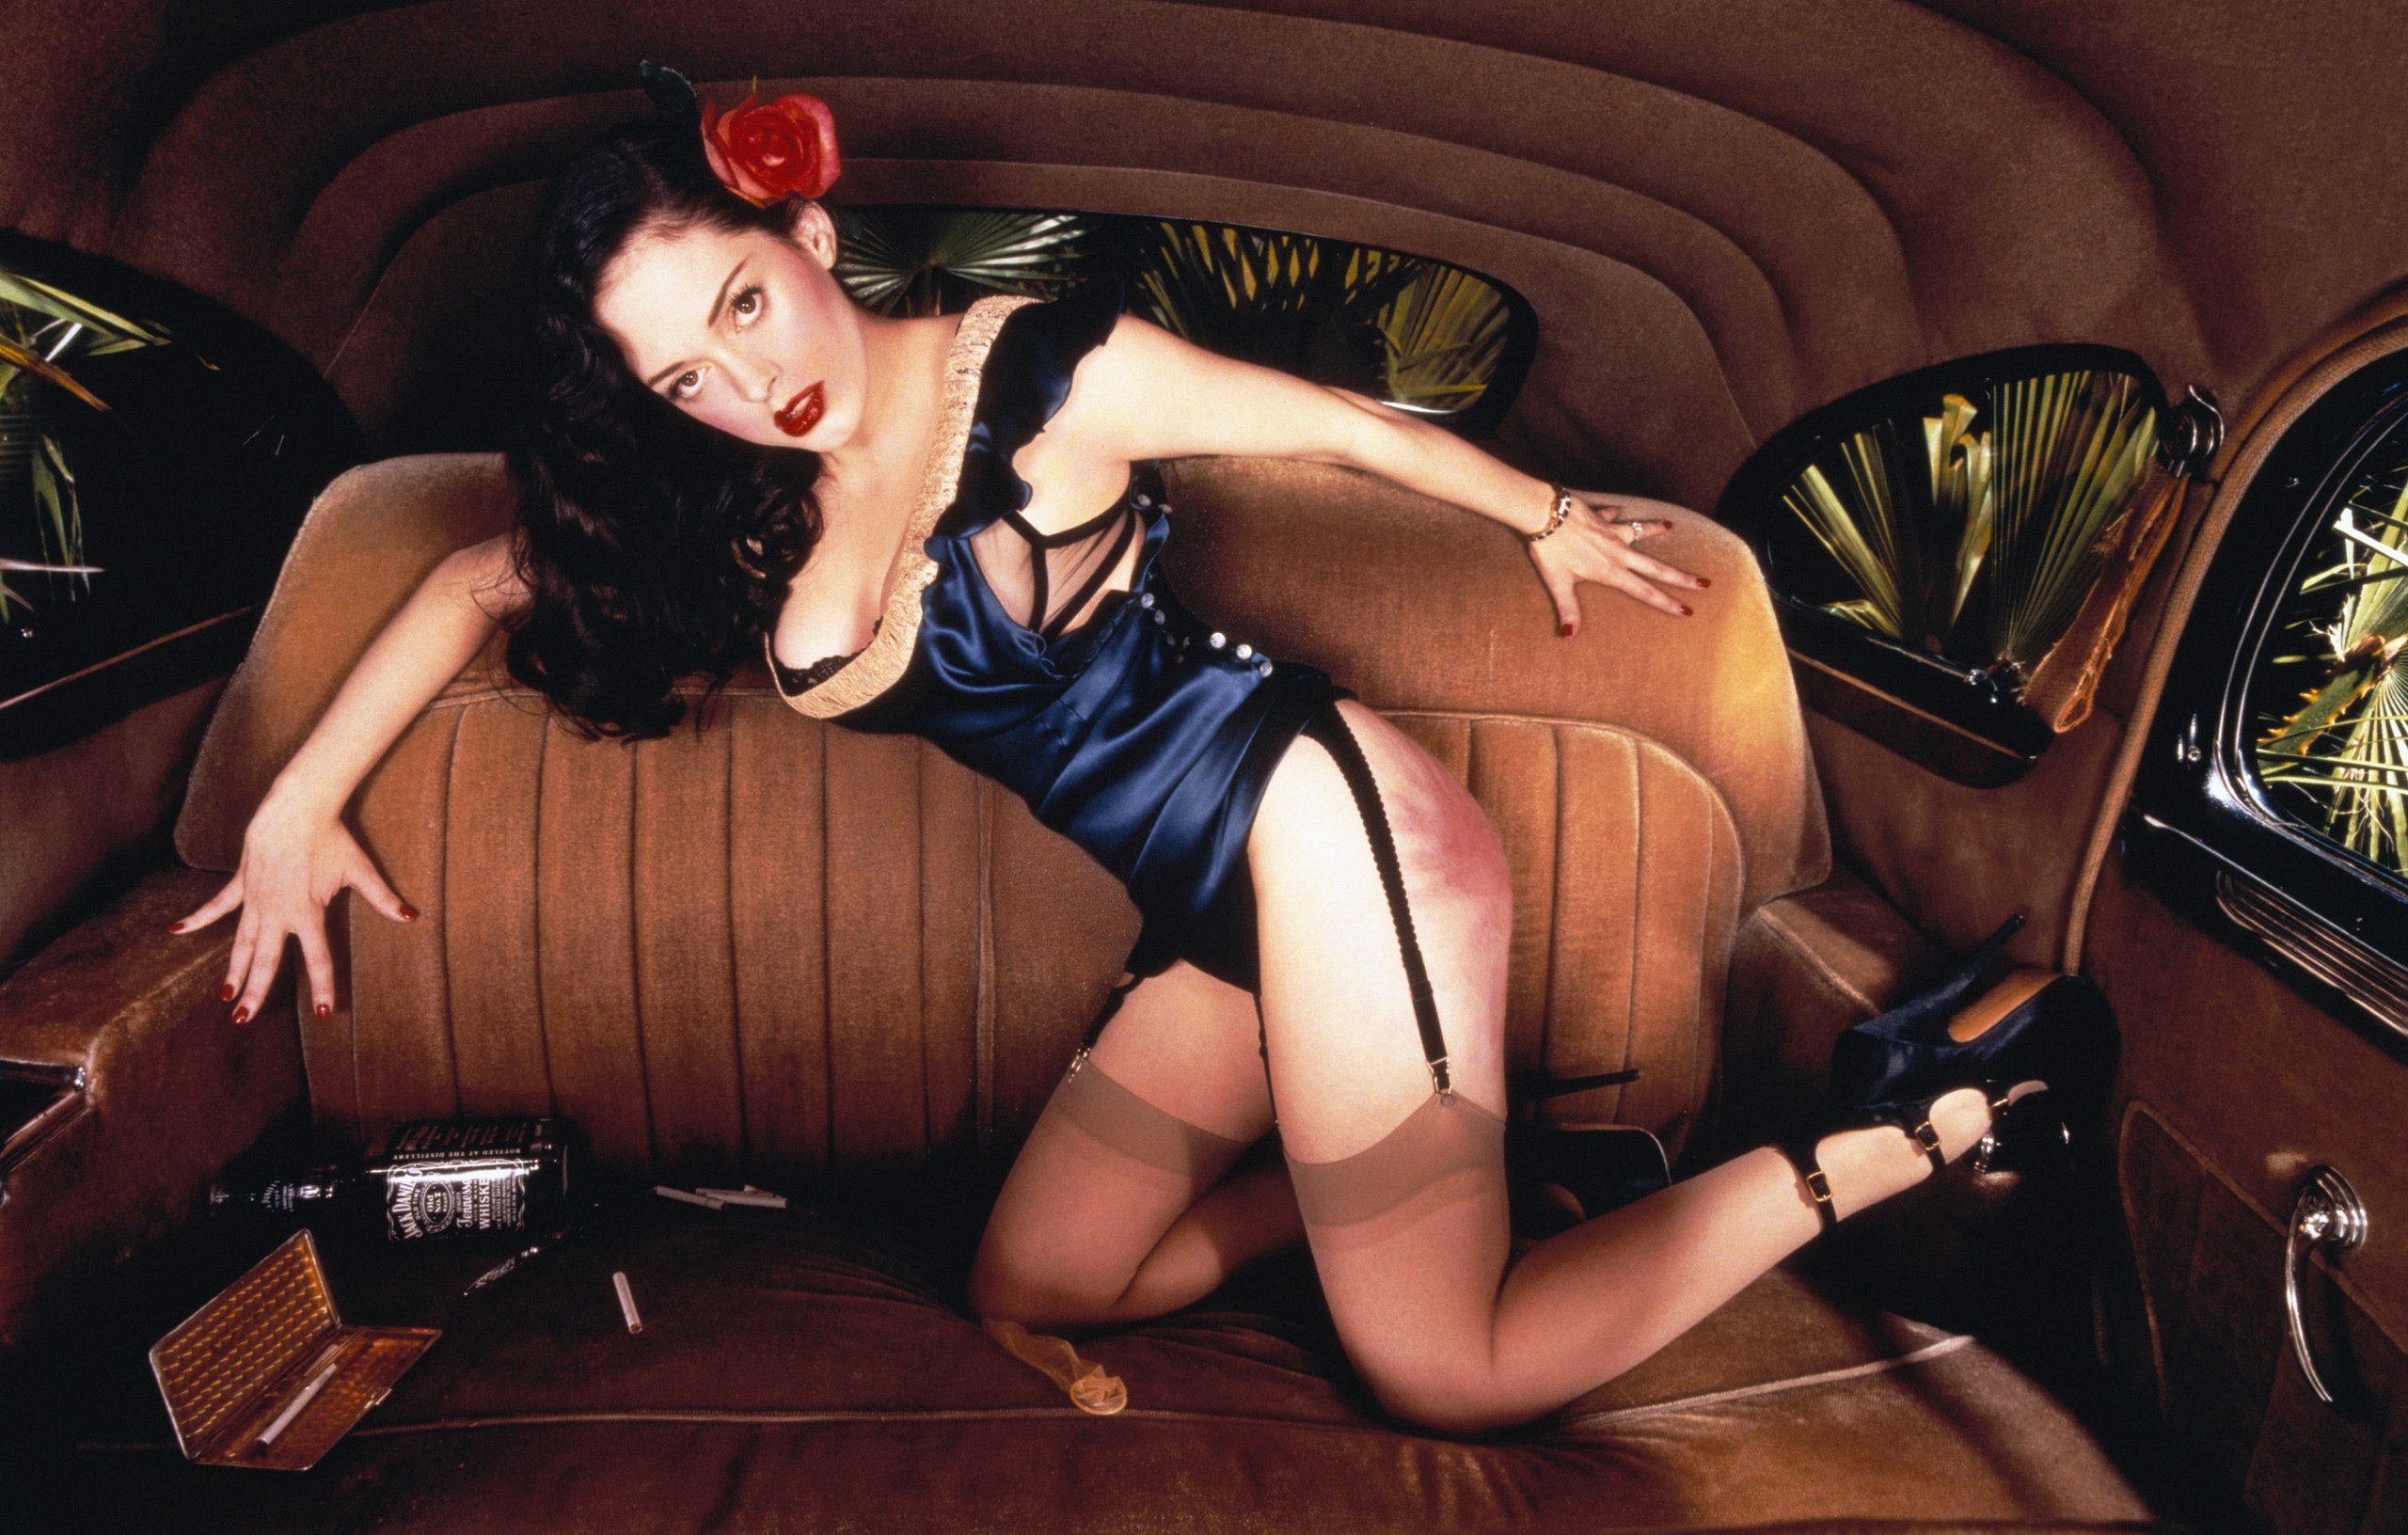 Роуз макгоуэн секс 3 фотография